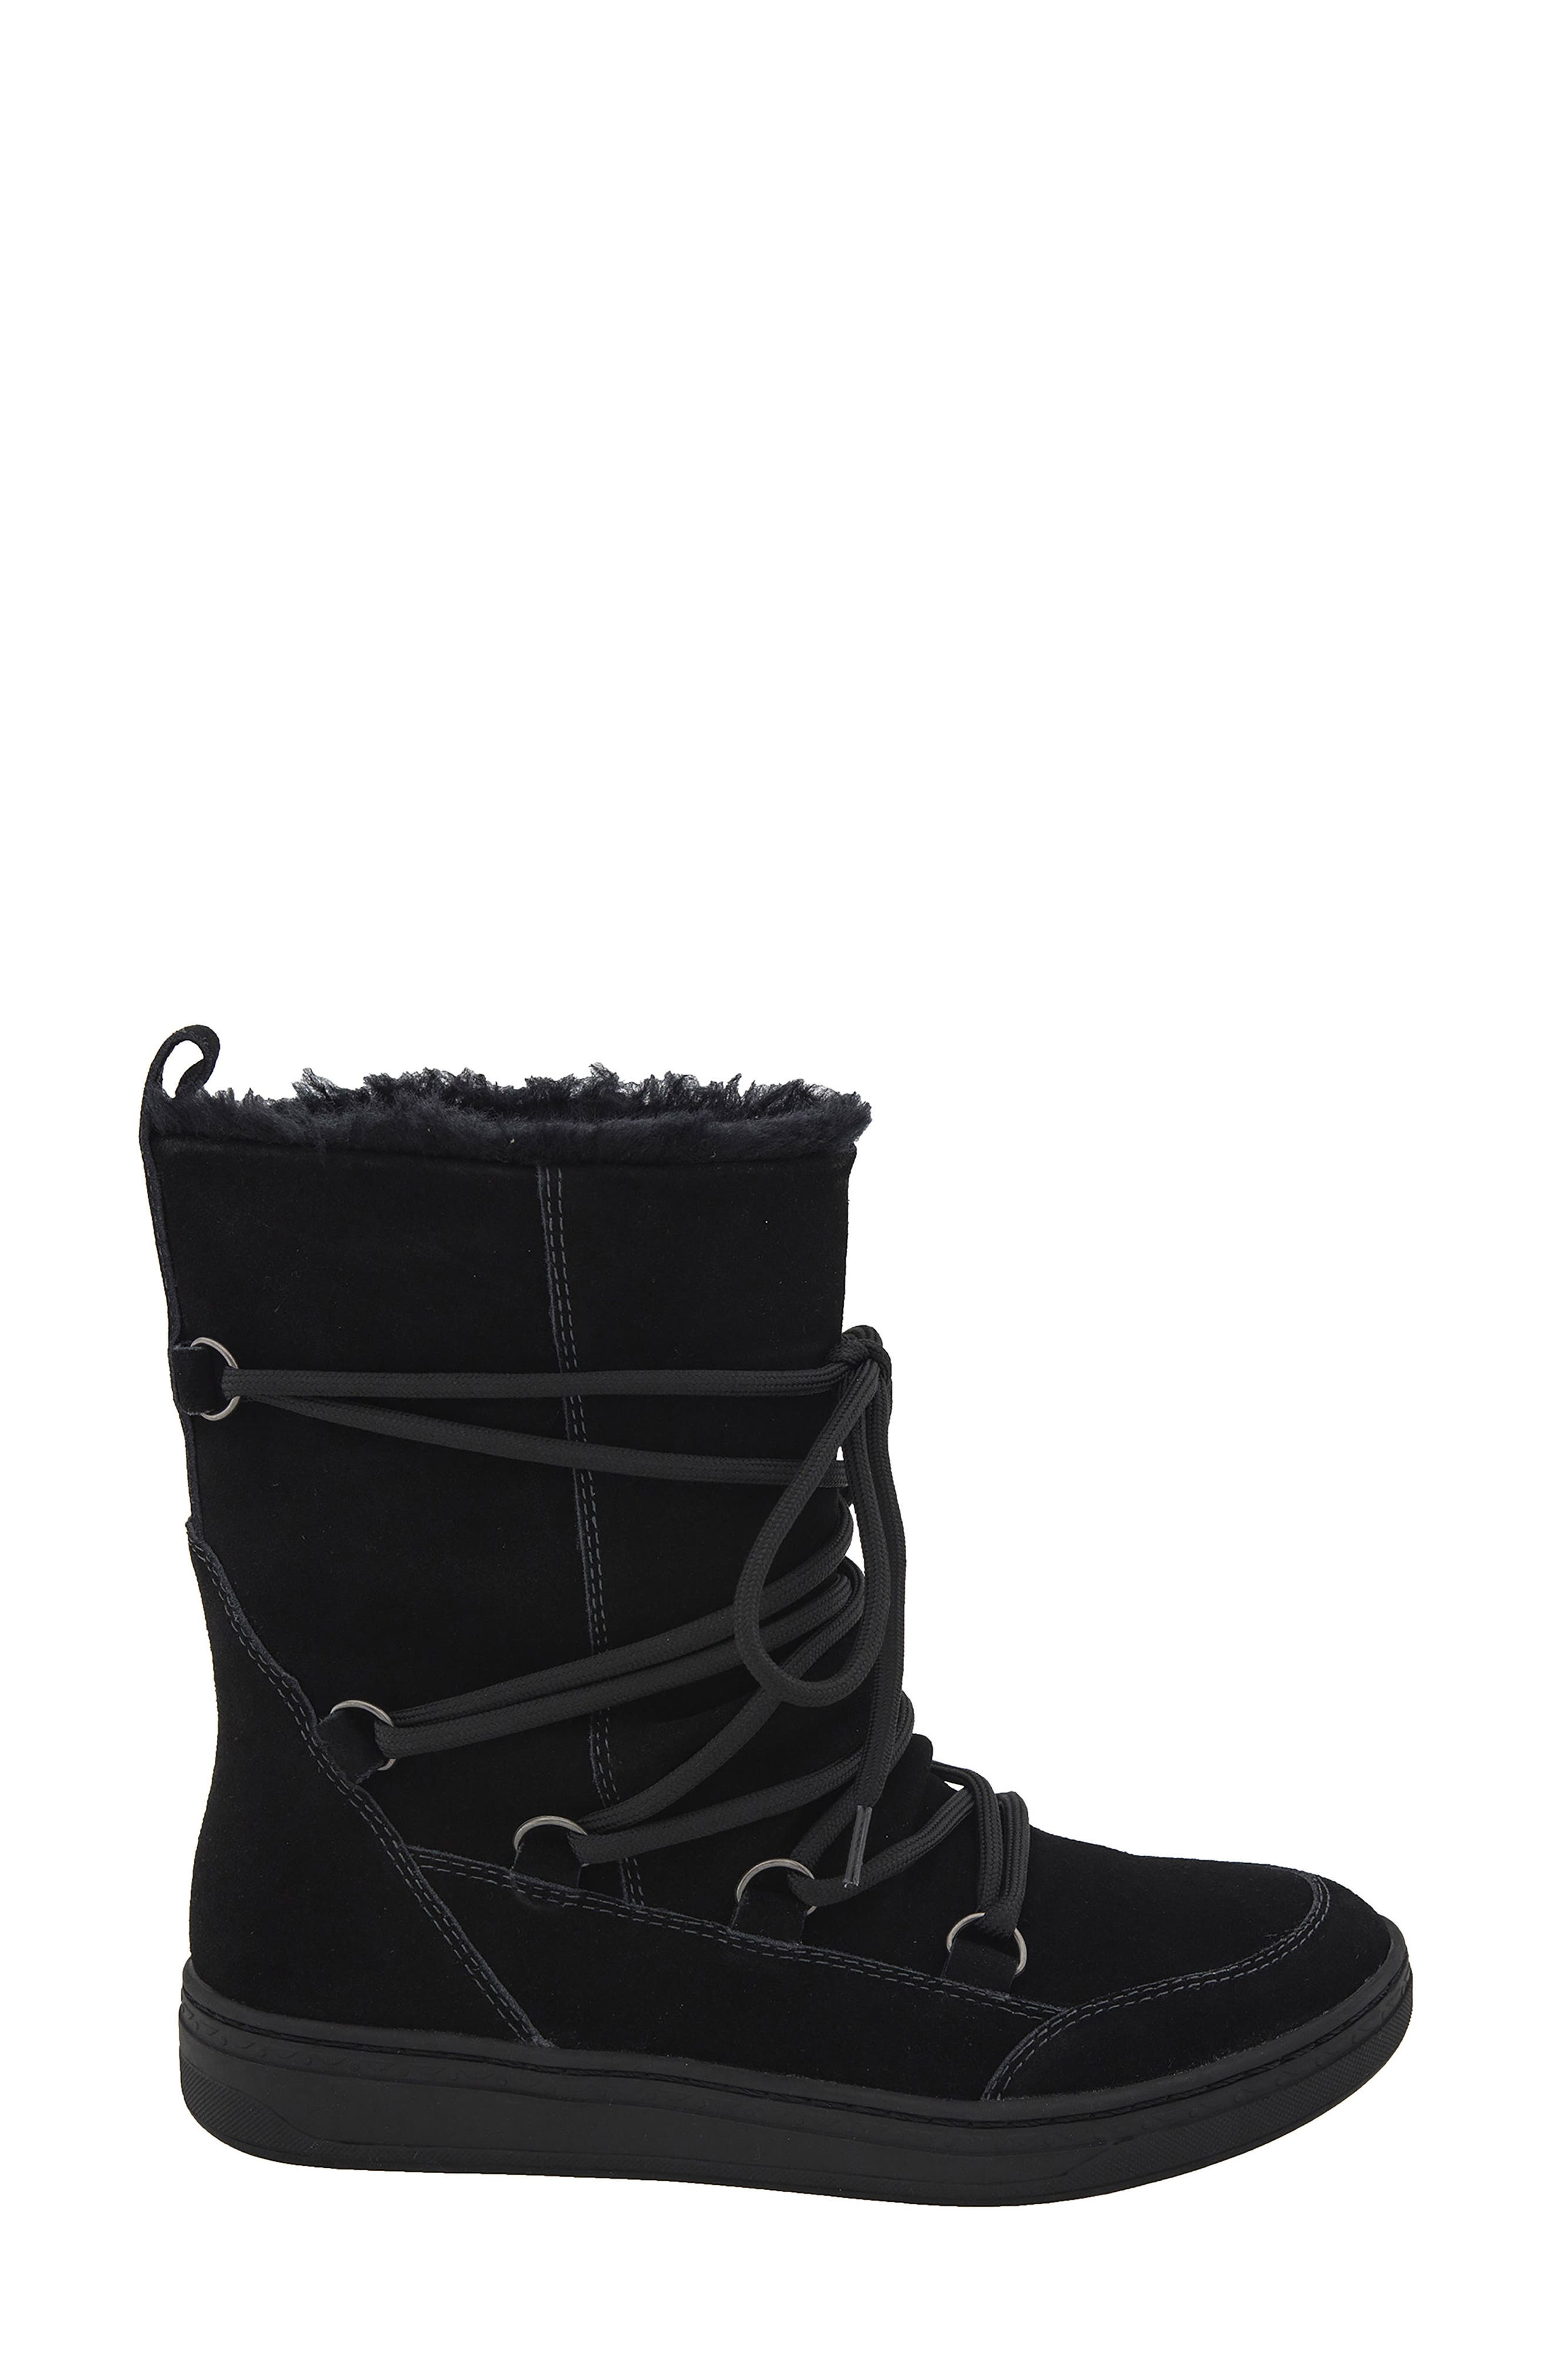 Zodiac Water Resistant Boot,                             Alternate thumbnail 3, color,                             Black Suede